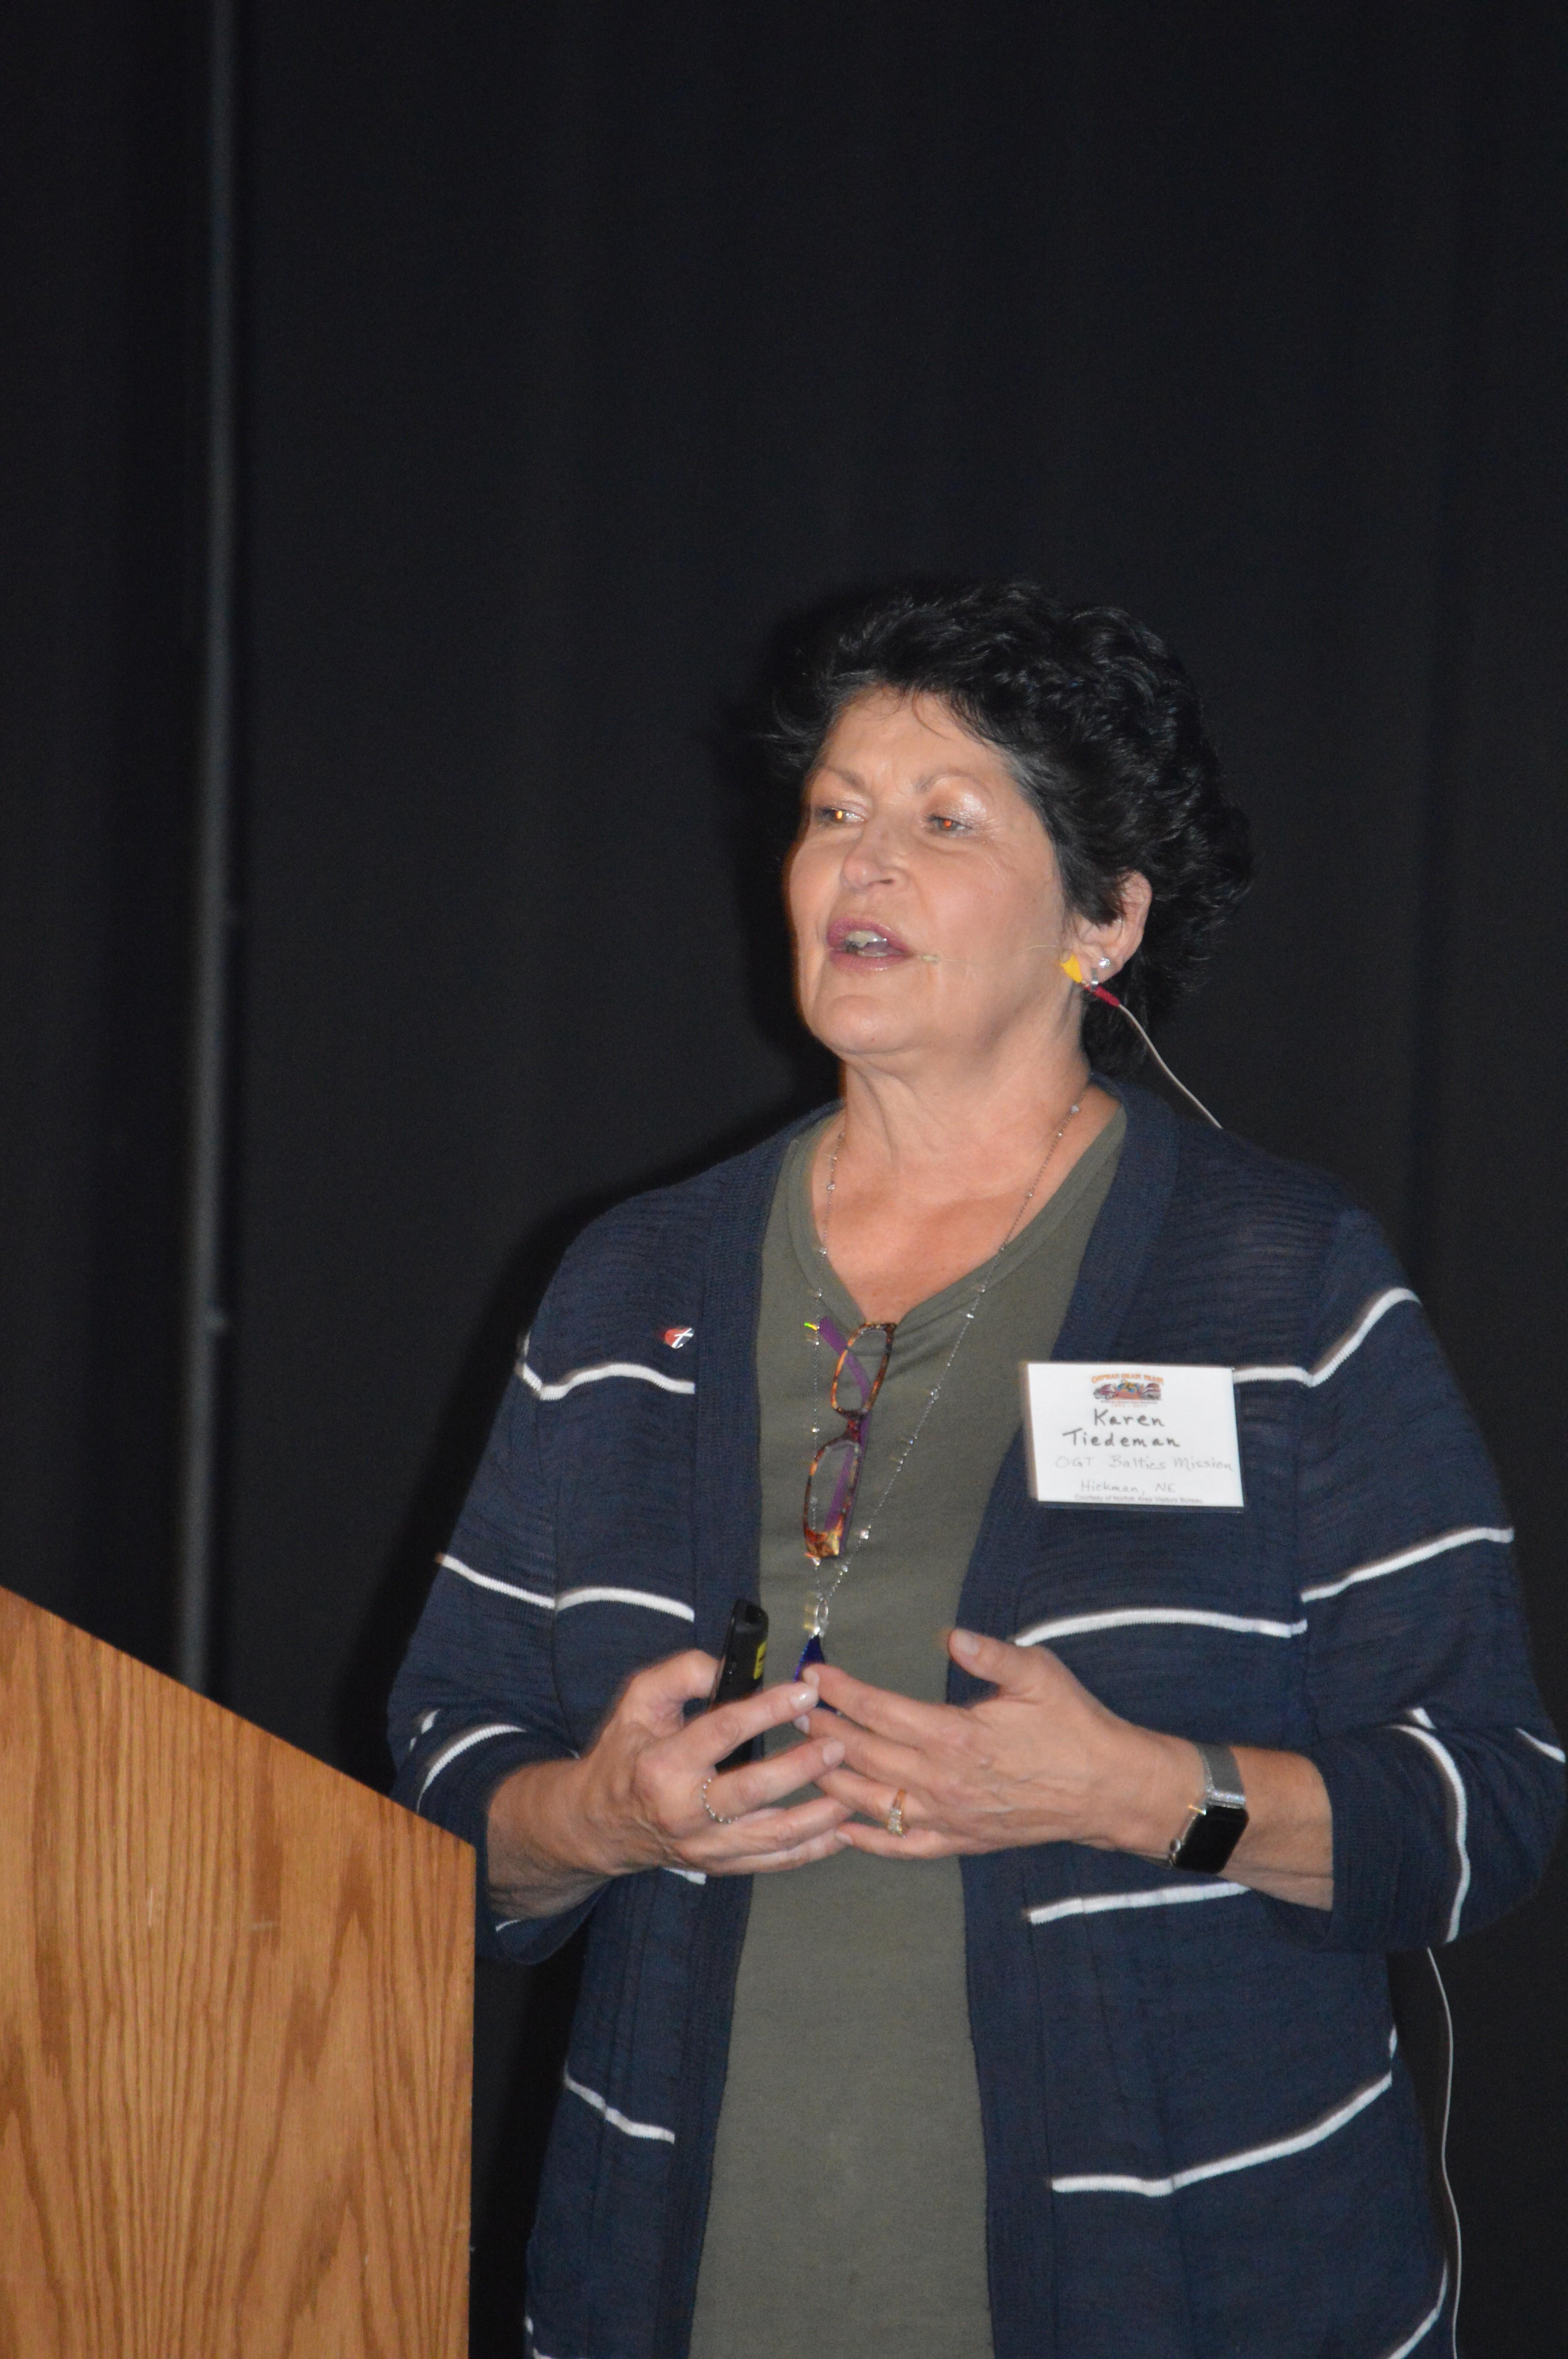 Karen Tiedeman - Baltics Missions